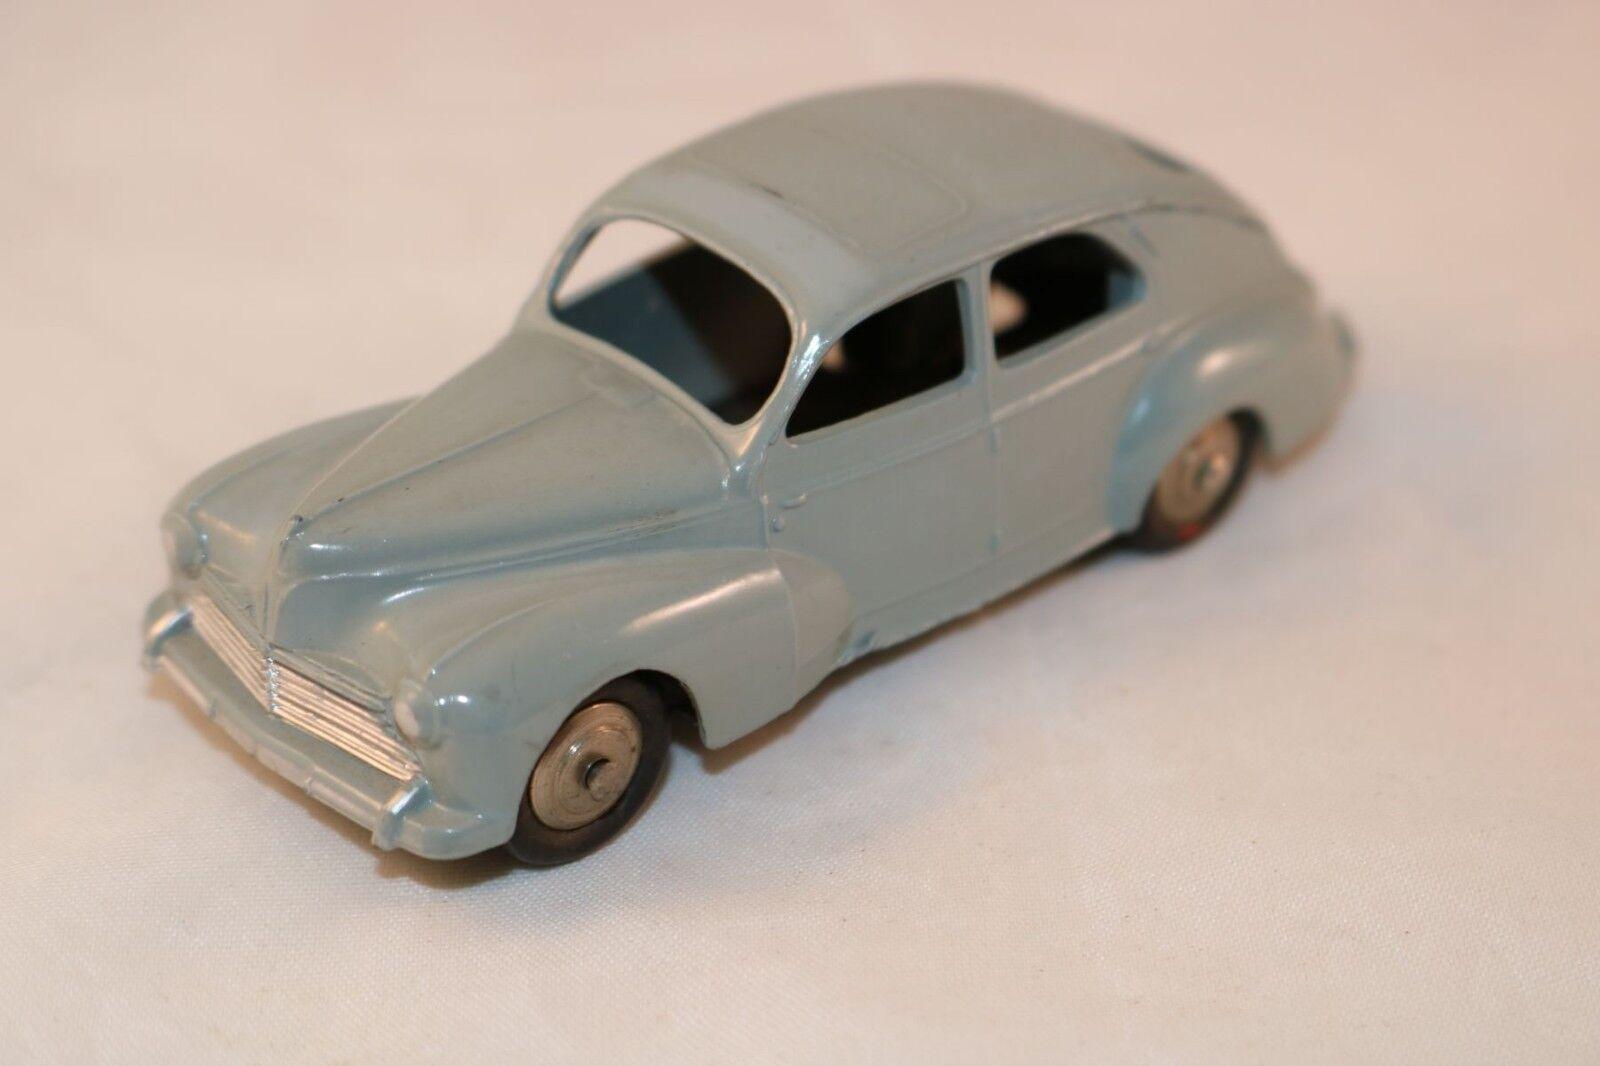 Dinky Toys 24R 24 R Peugeot 203 Gris 99.9% mint all original condition